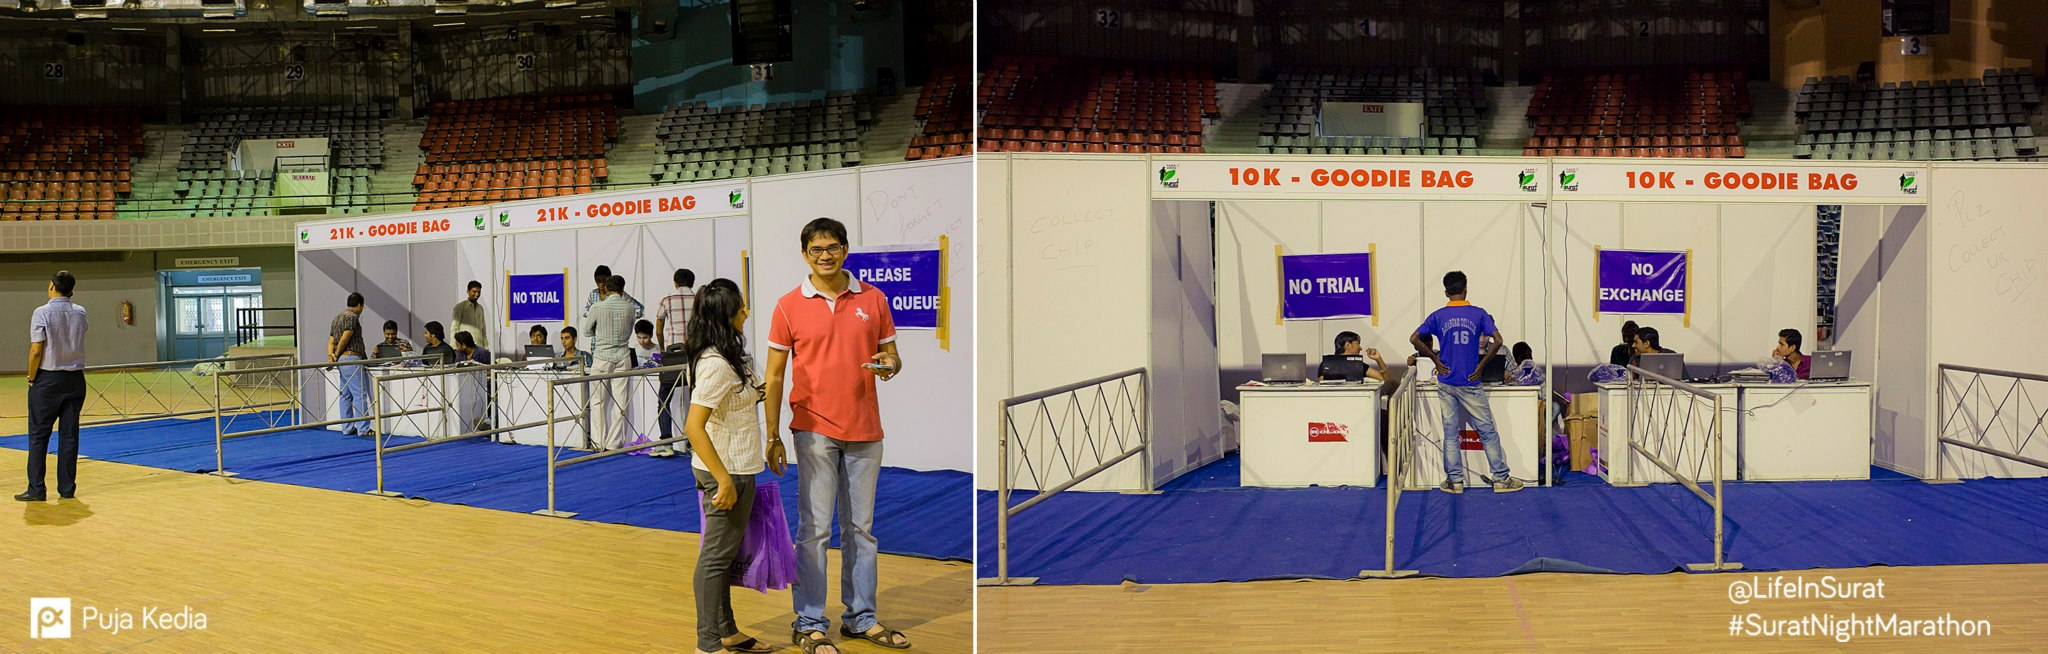 The Expo. #PreRaceEvent #IndoorStadium